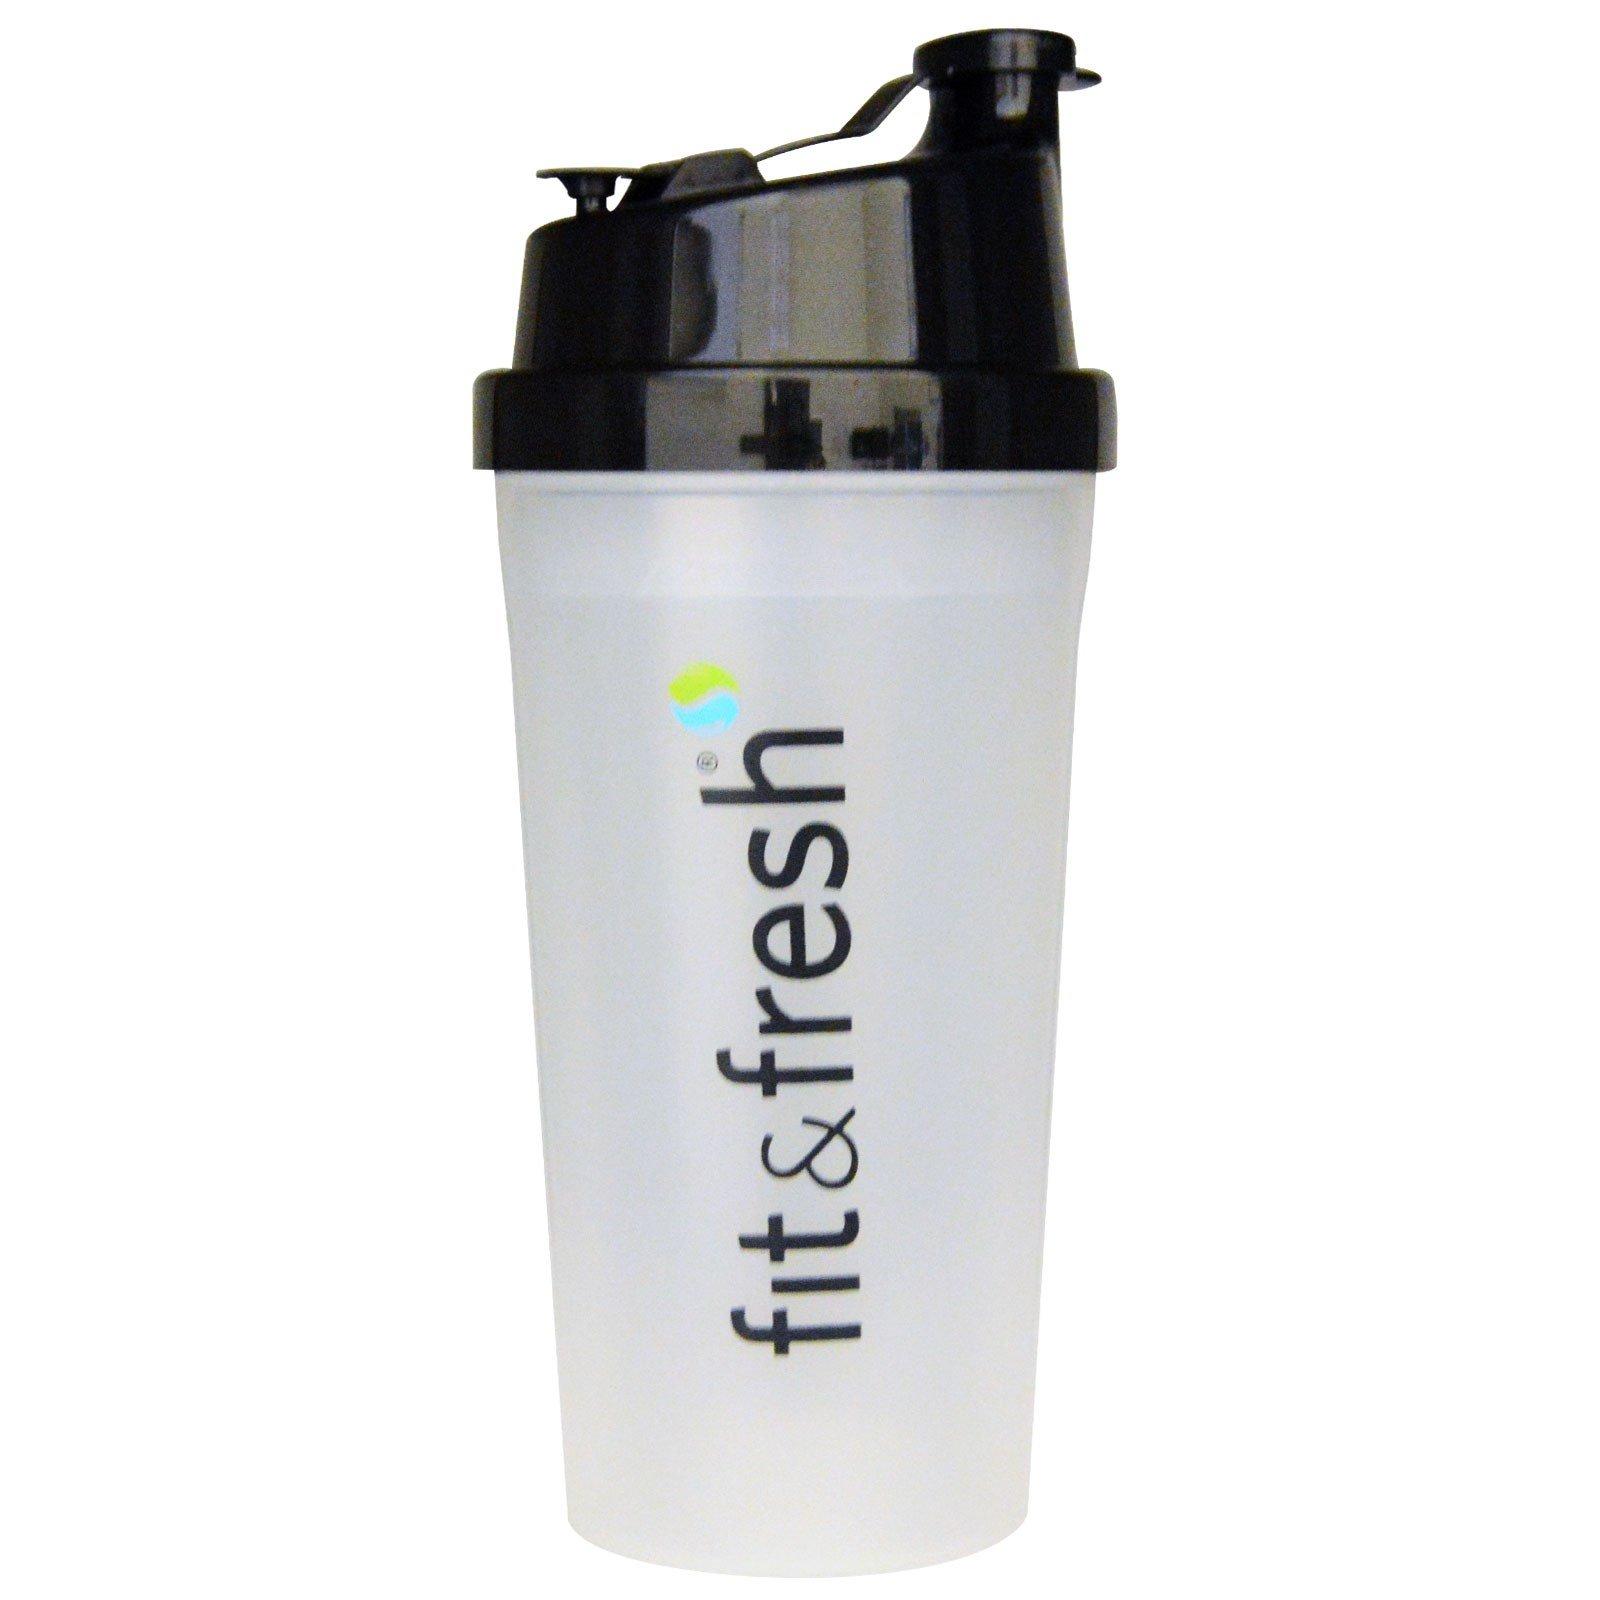 Pantene Pro‑V 3 Minute Miracle Moisture Renewal Deep Conditioner 8 OZ (Pack of 4) + (Vitaminder Power Shaker Bottle, 20 oz Bottle) by Pantene (Image #2)